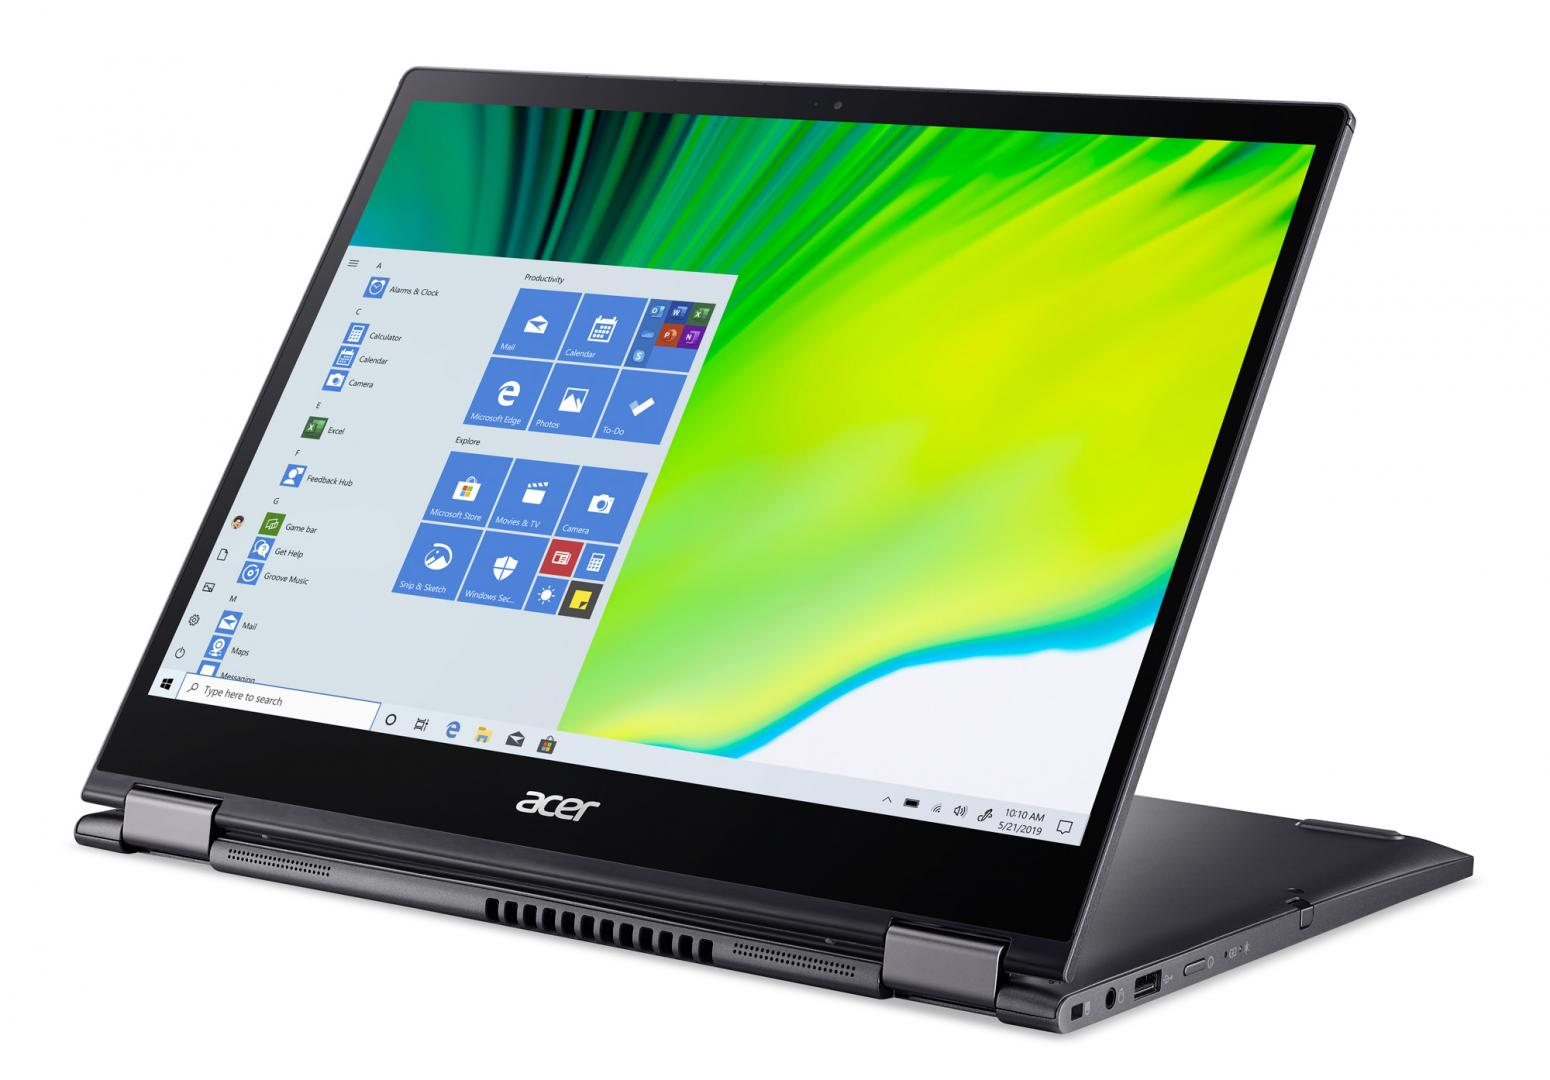 Ordinateur portable Acer Spin 5 SP513-54N-59ED Gris - QHD Tactile, Stylet - photo 6